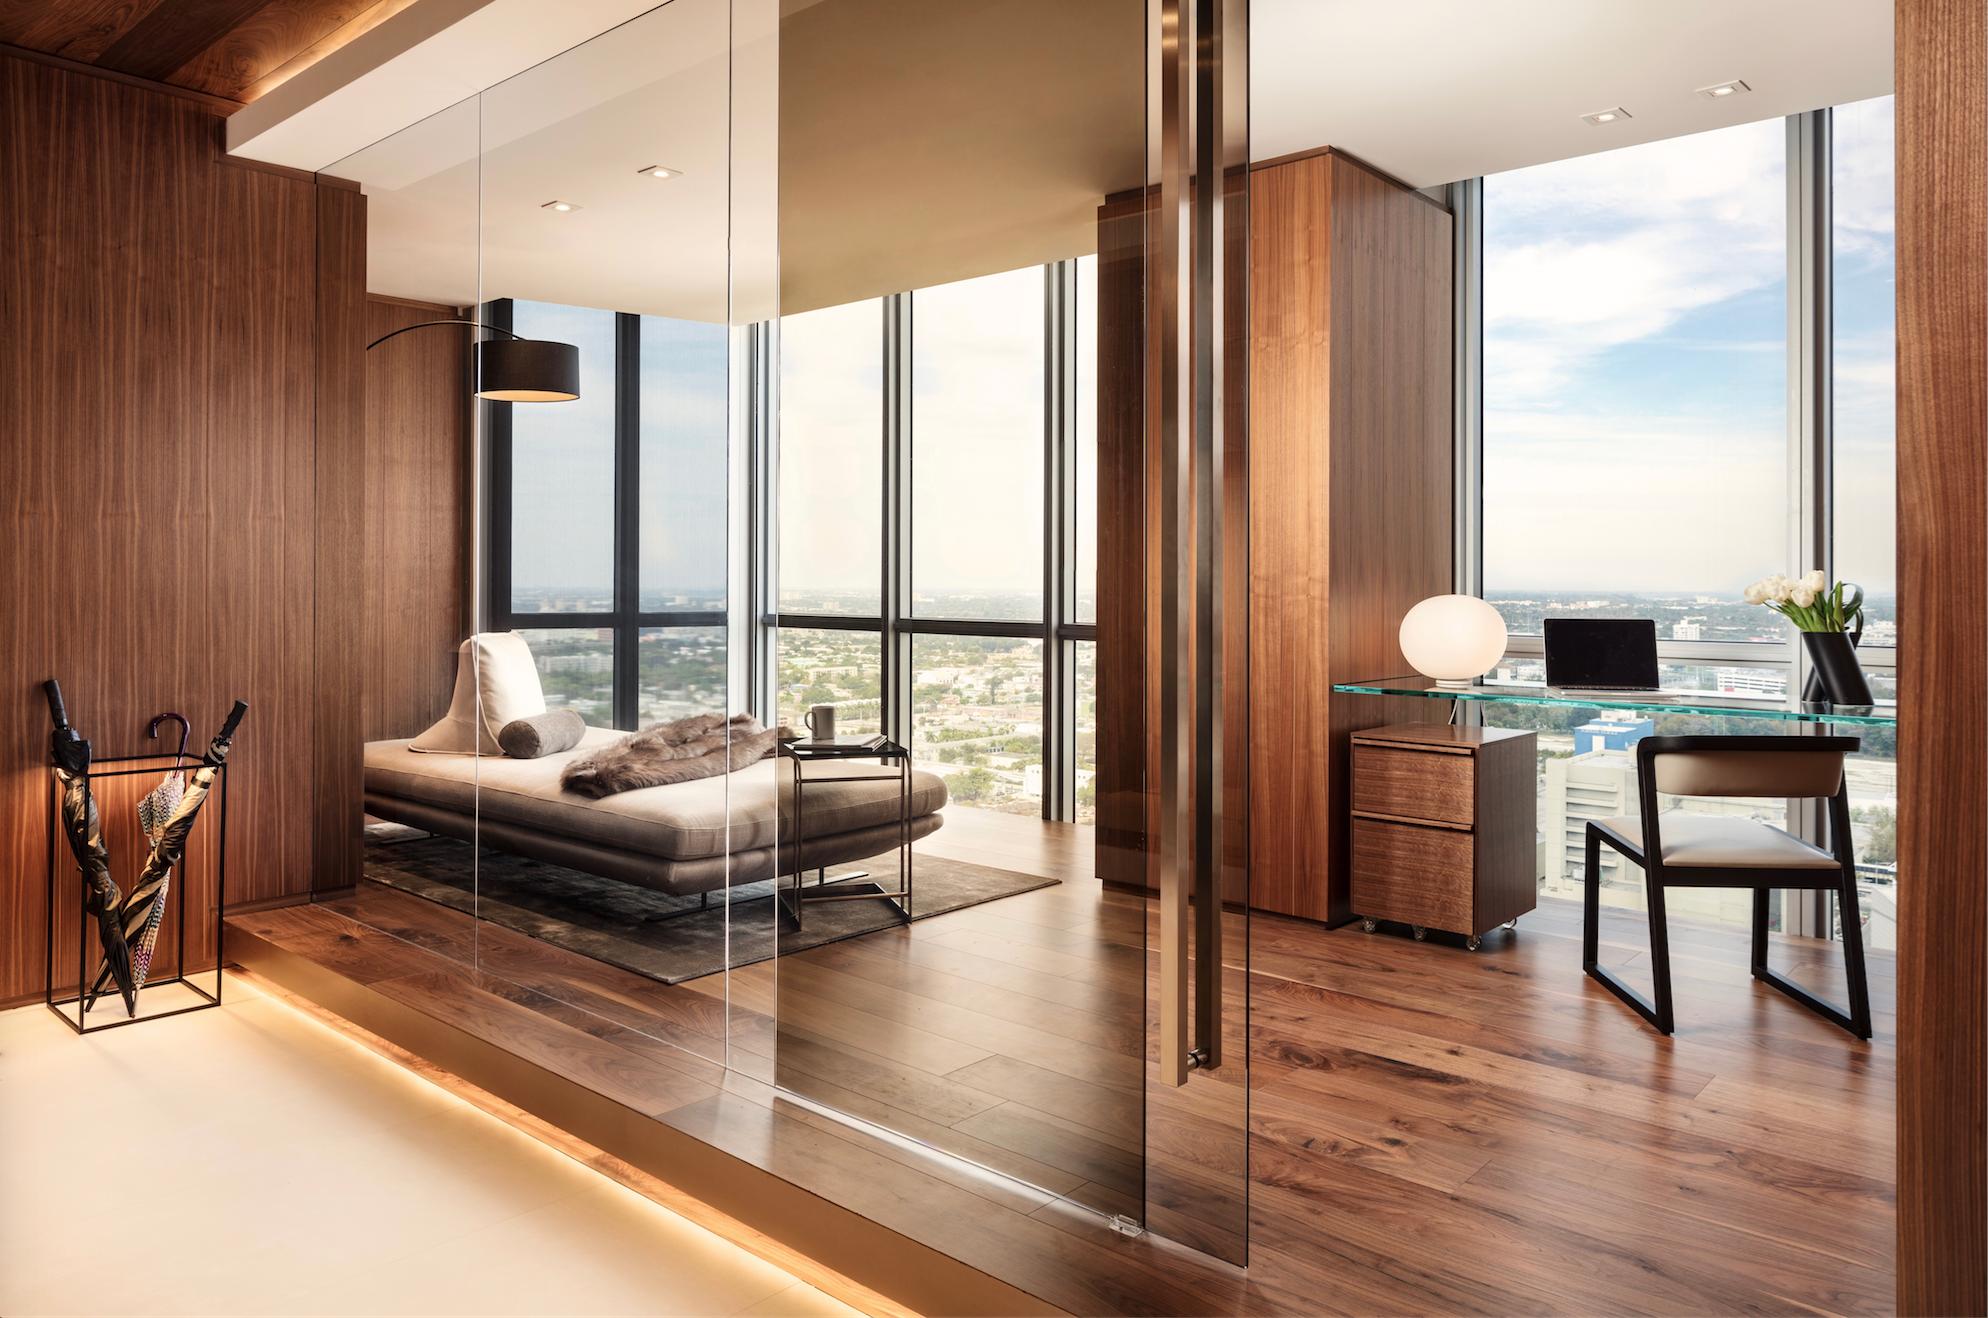 Miami apartment interior by Eric Arthur Dyer